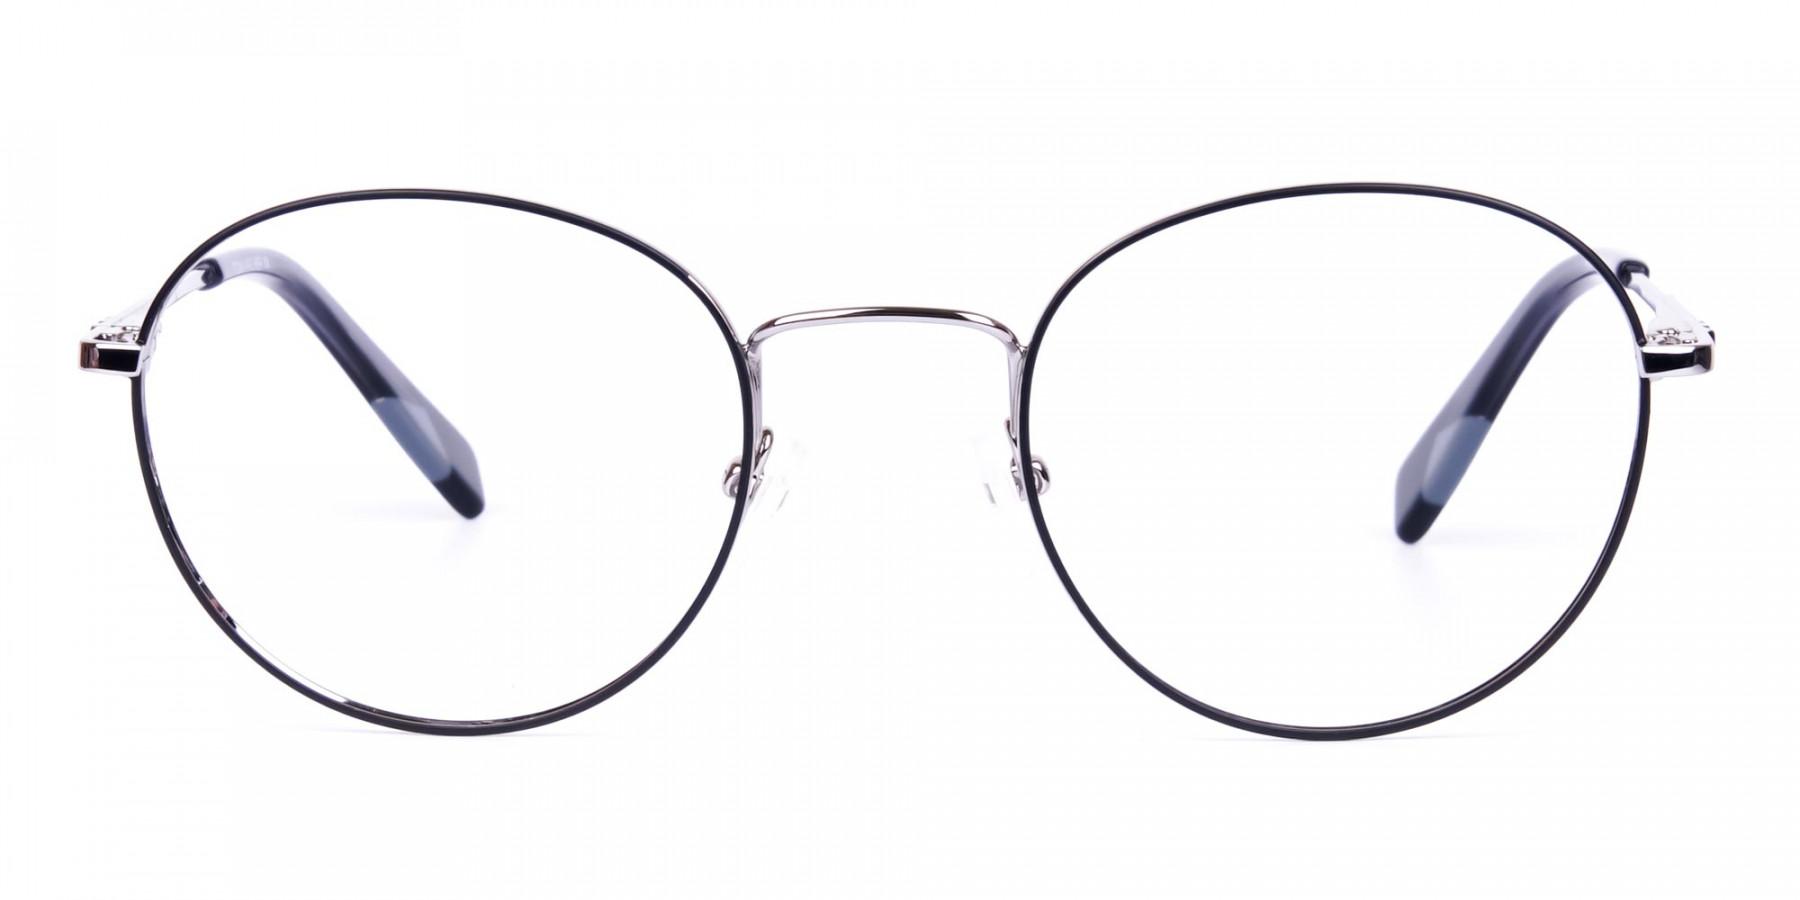 Stylish-Black-Silver-Round-Glasses-1